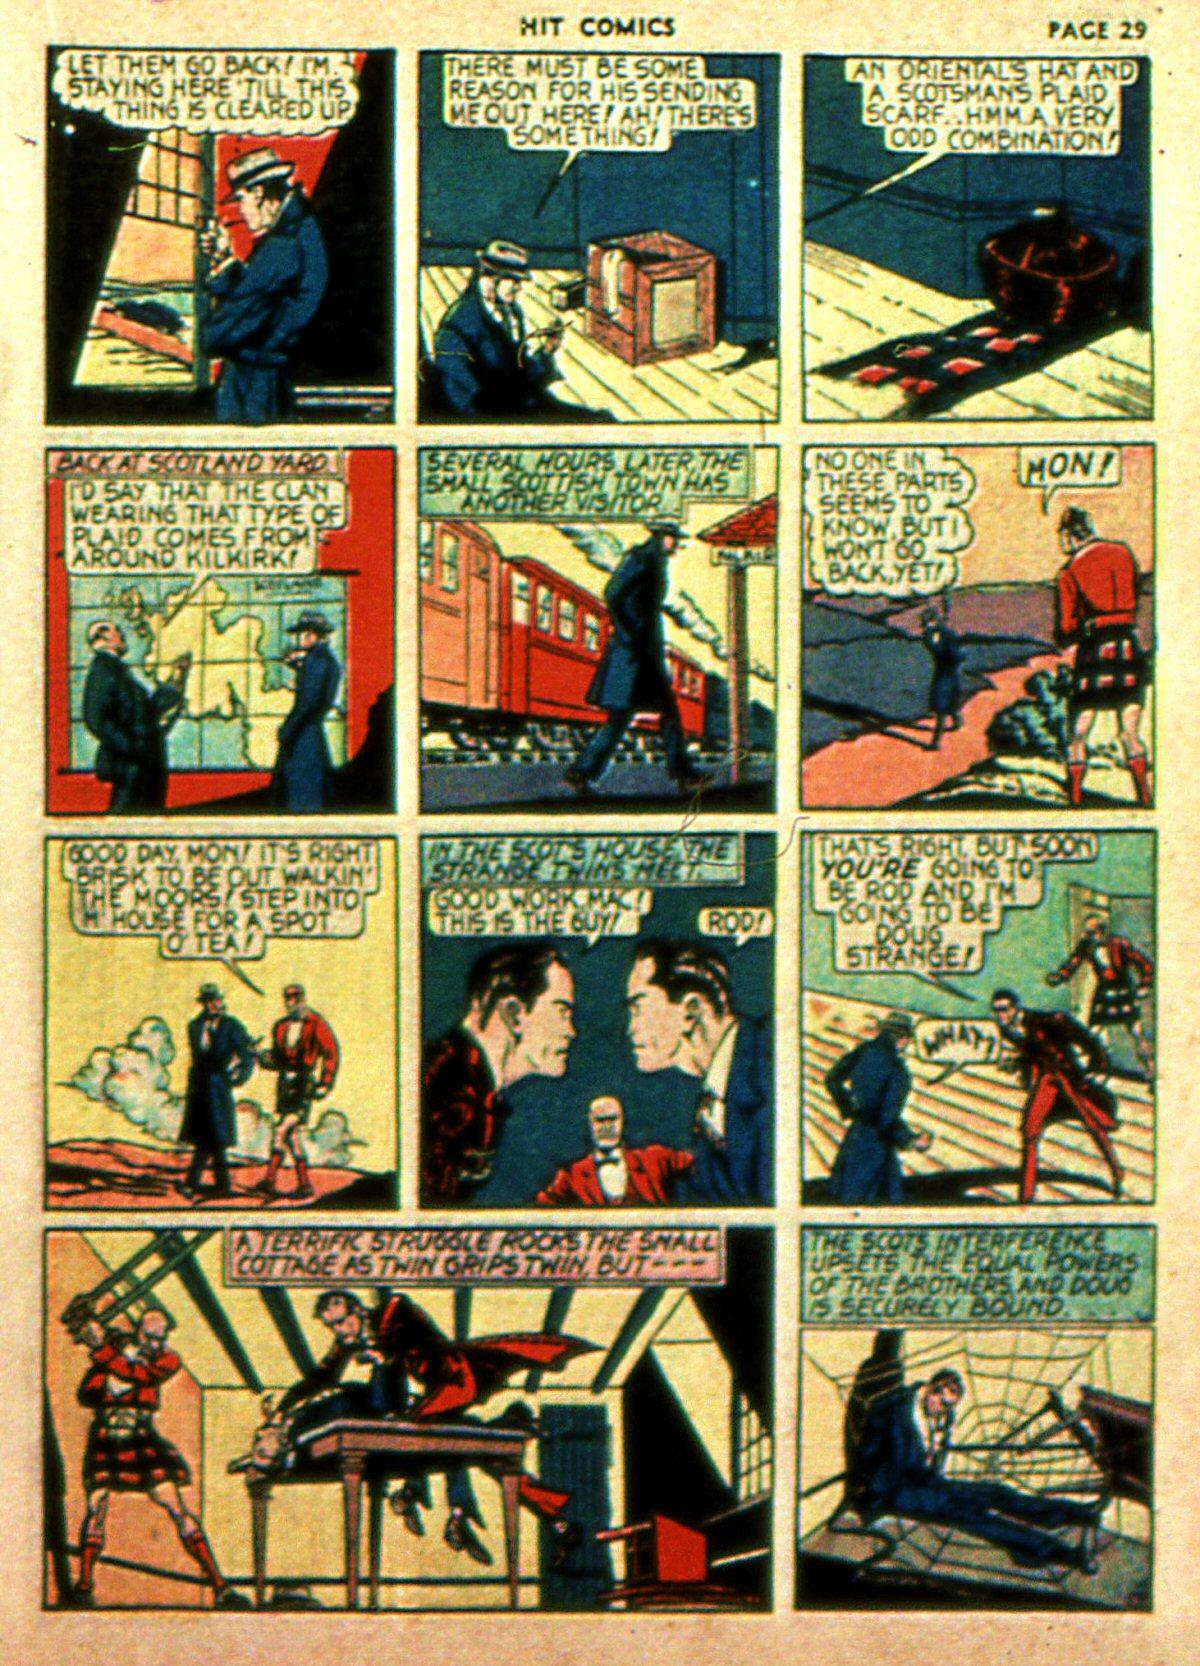 Read online Hit Comics comic -  Issue #2 - 31